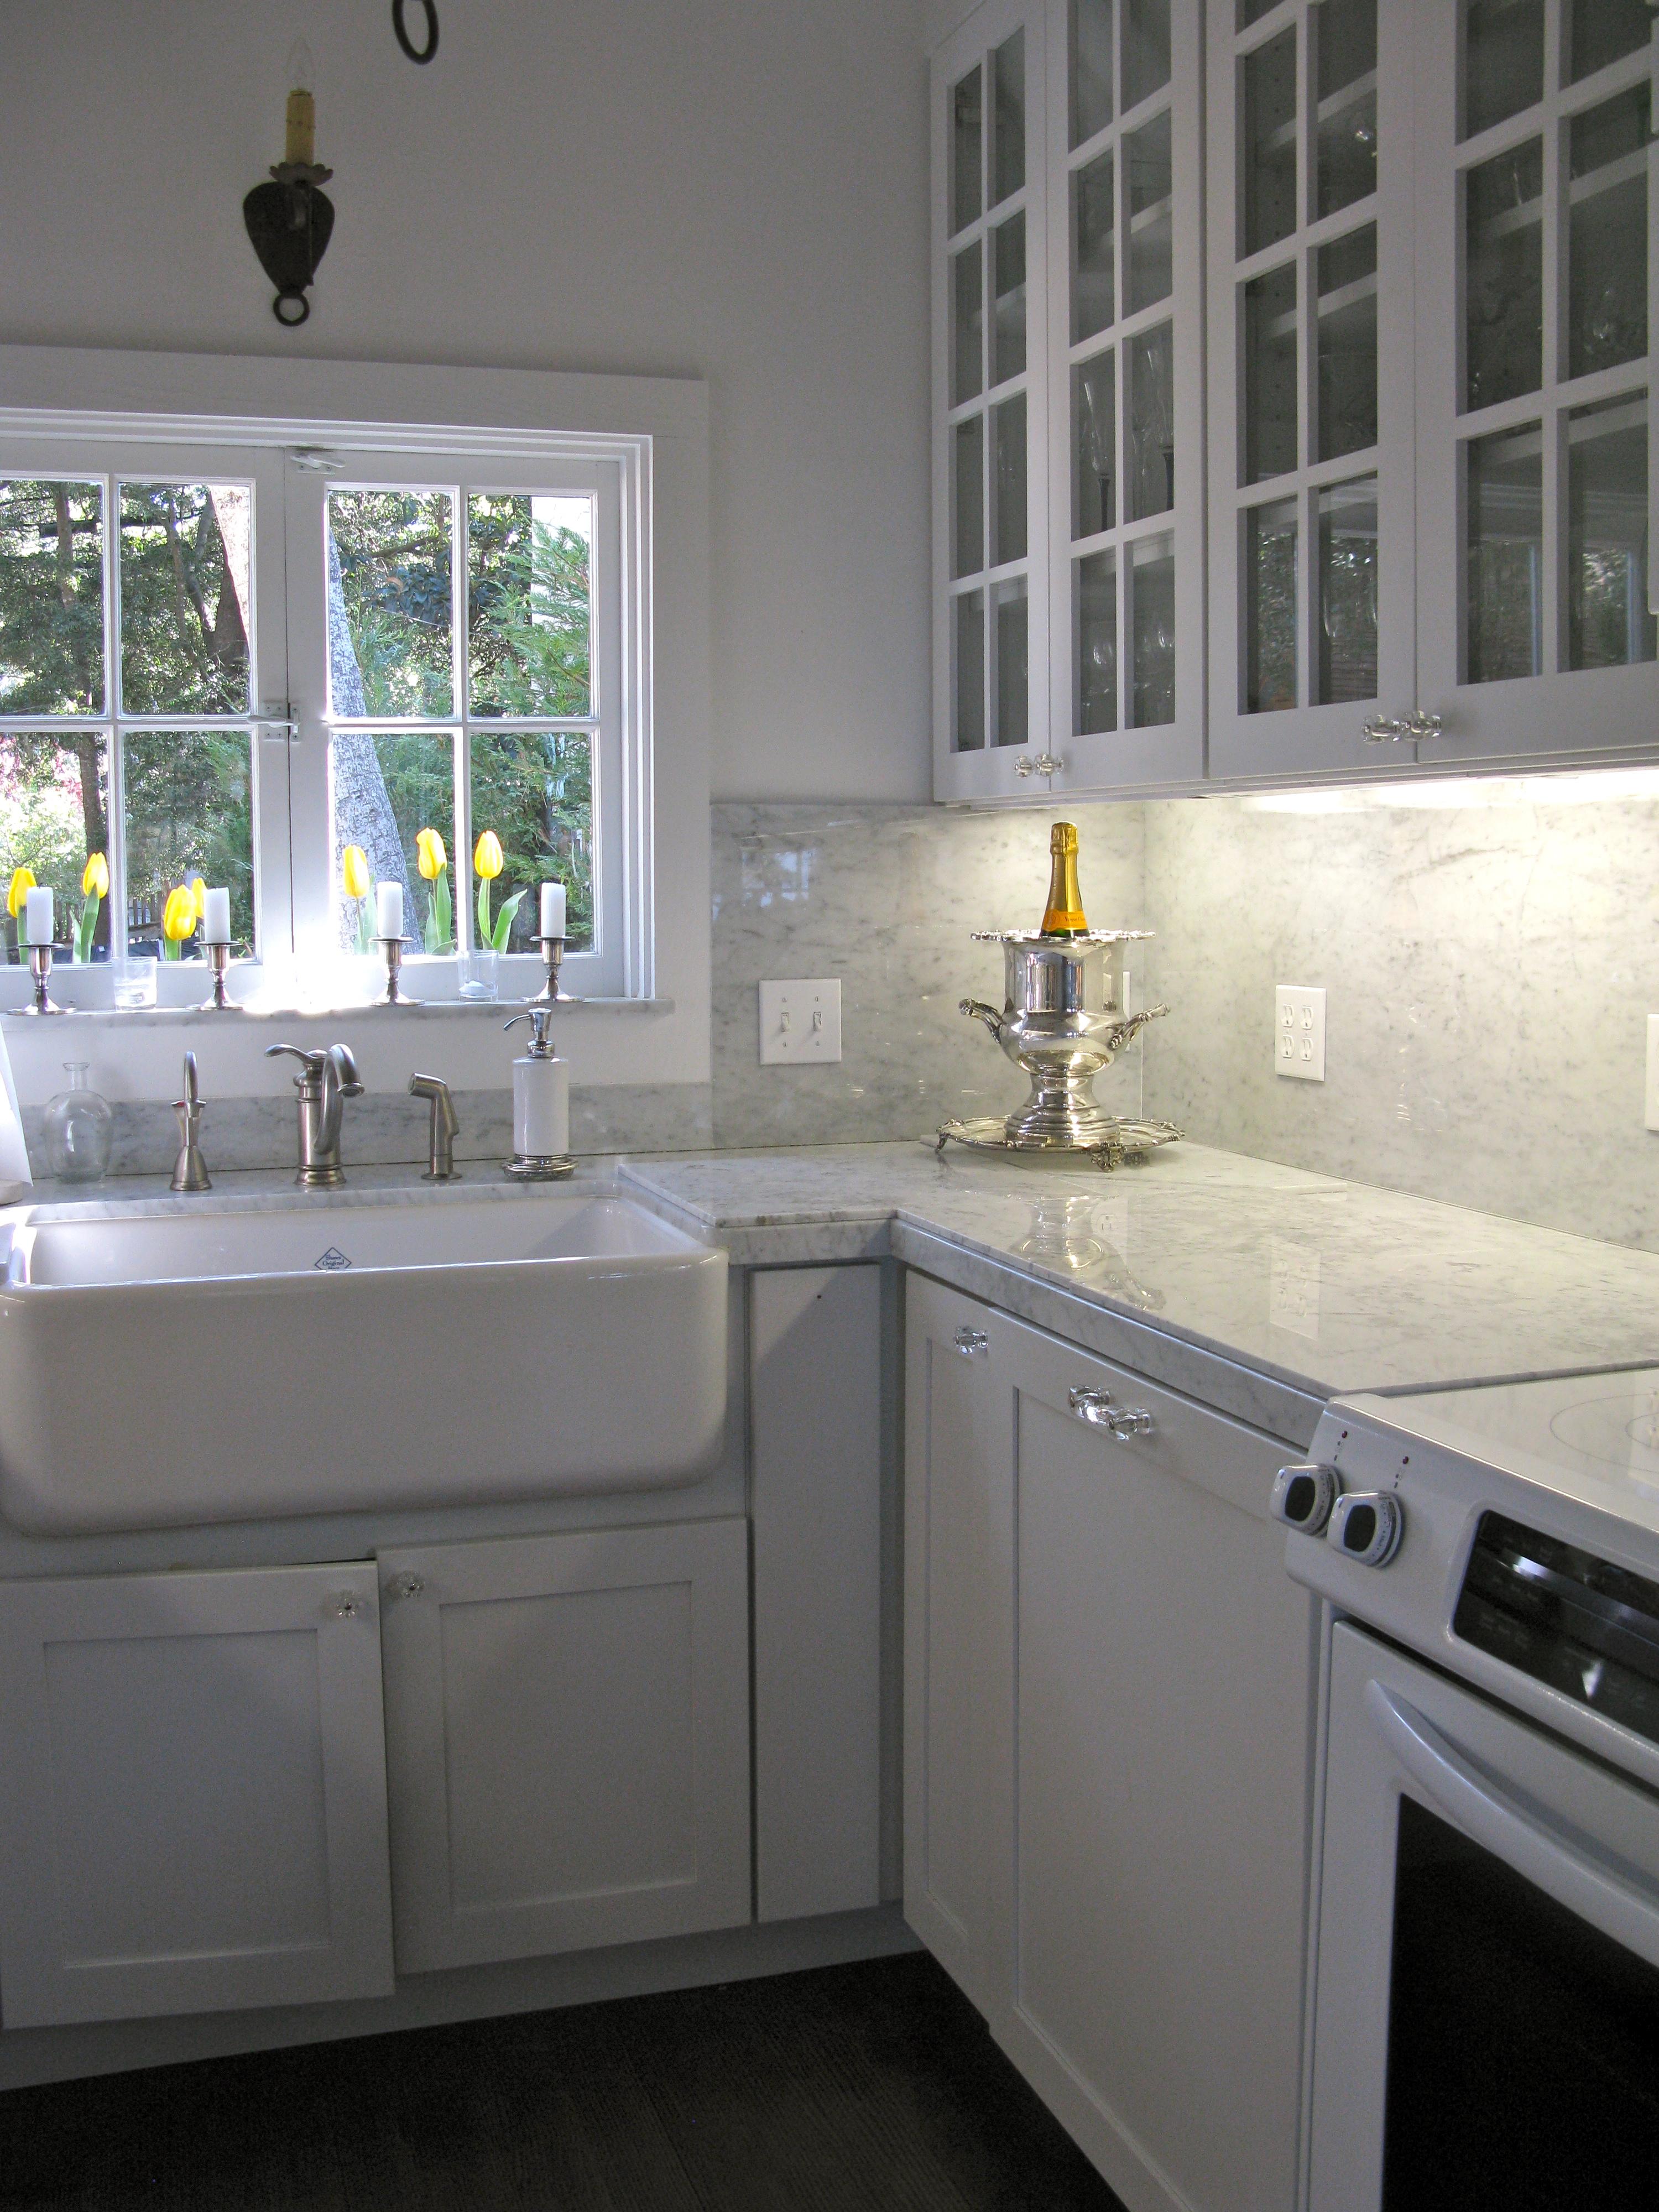 Carrara Marble Backsplash Ideas - HomesFeed